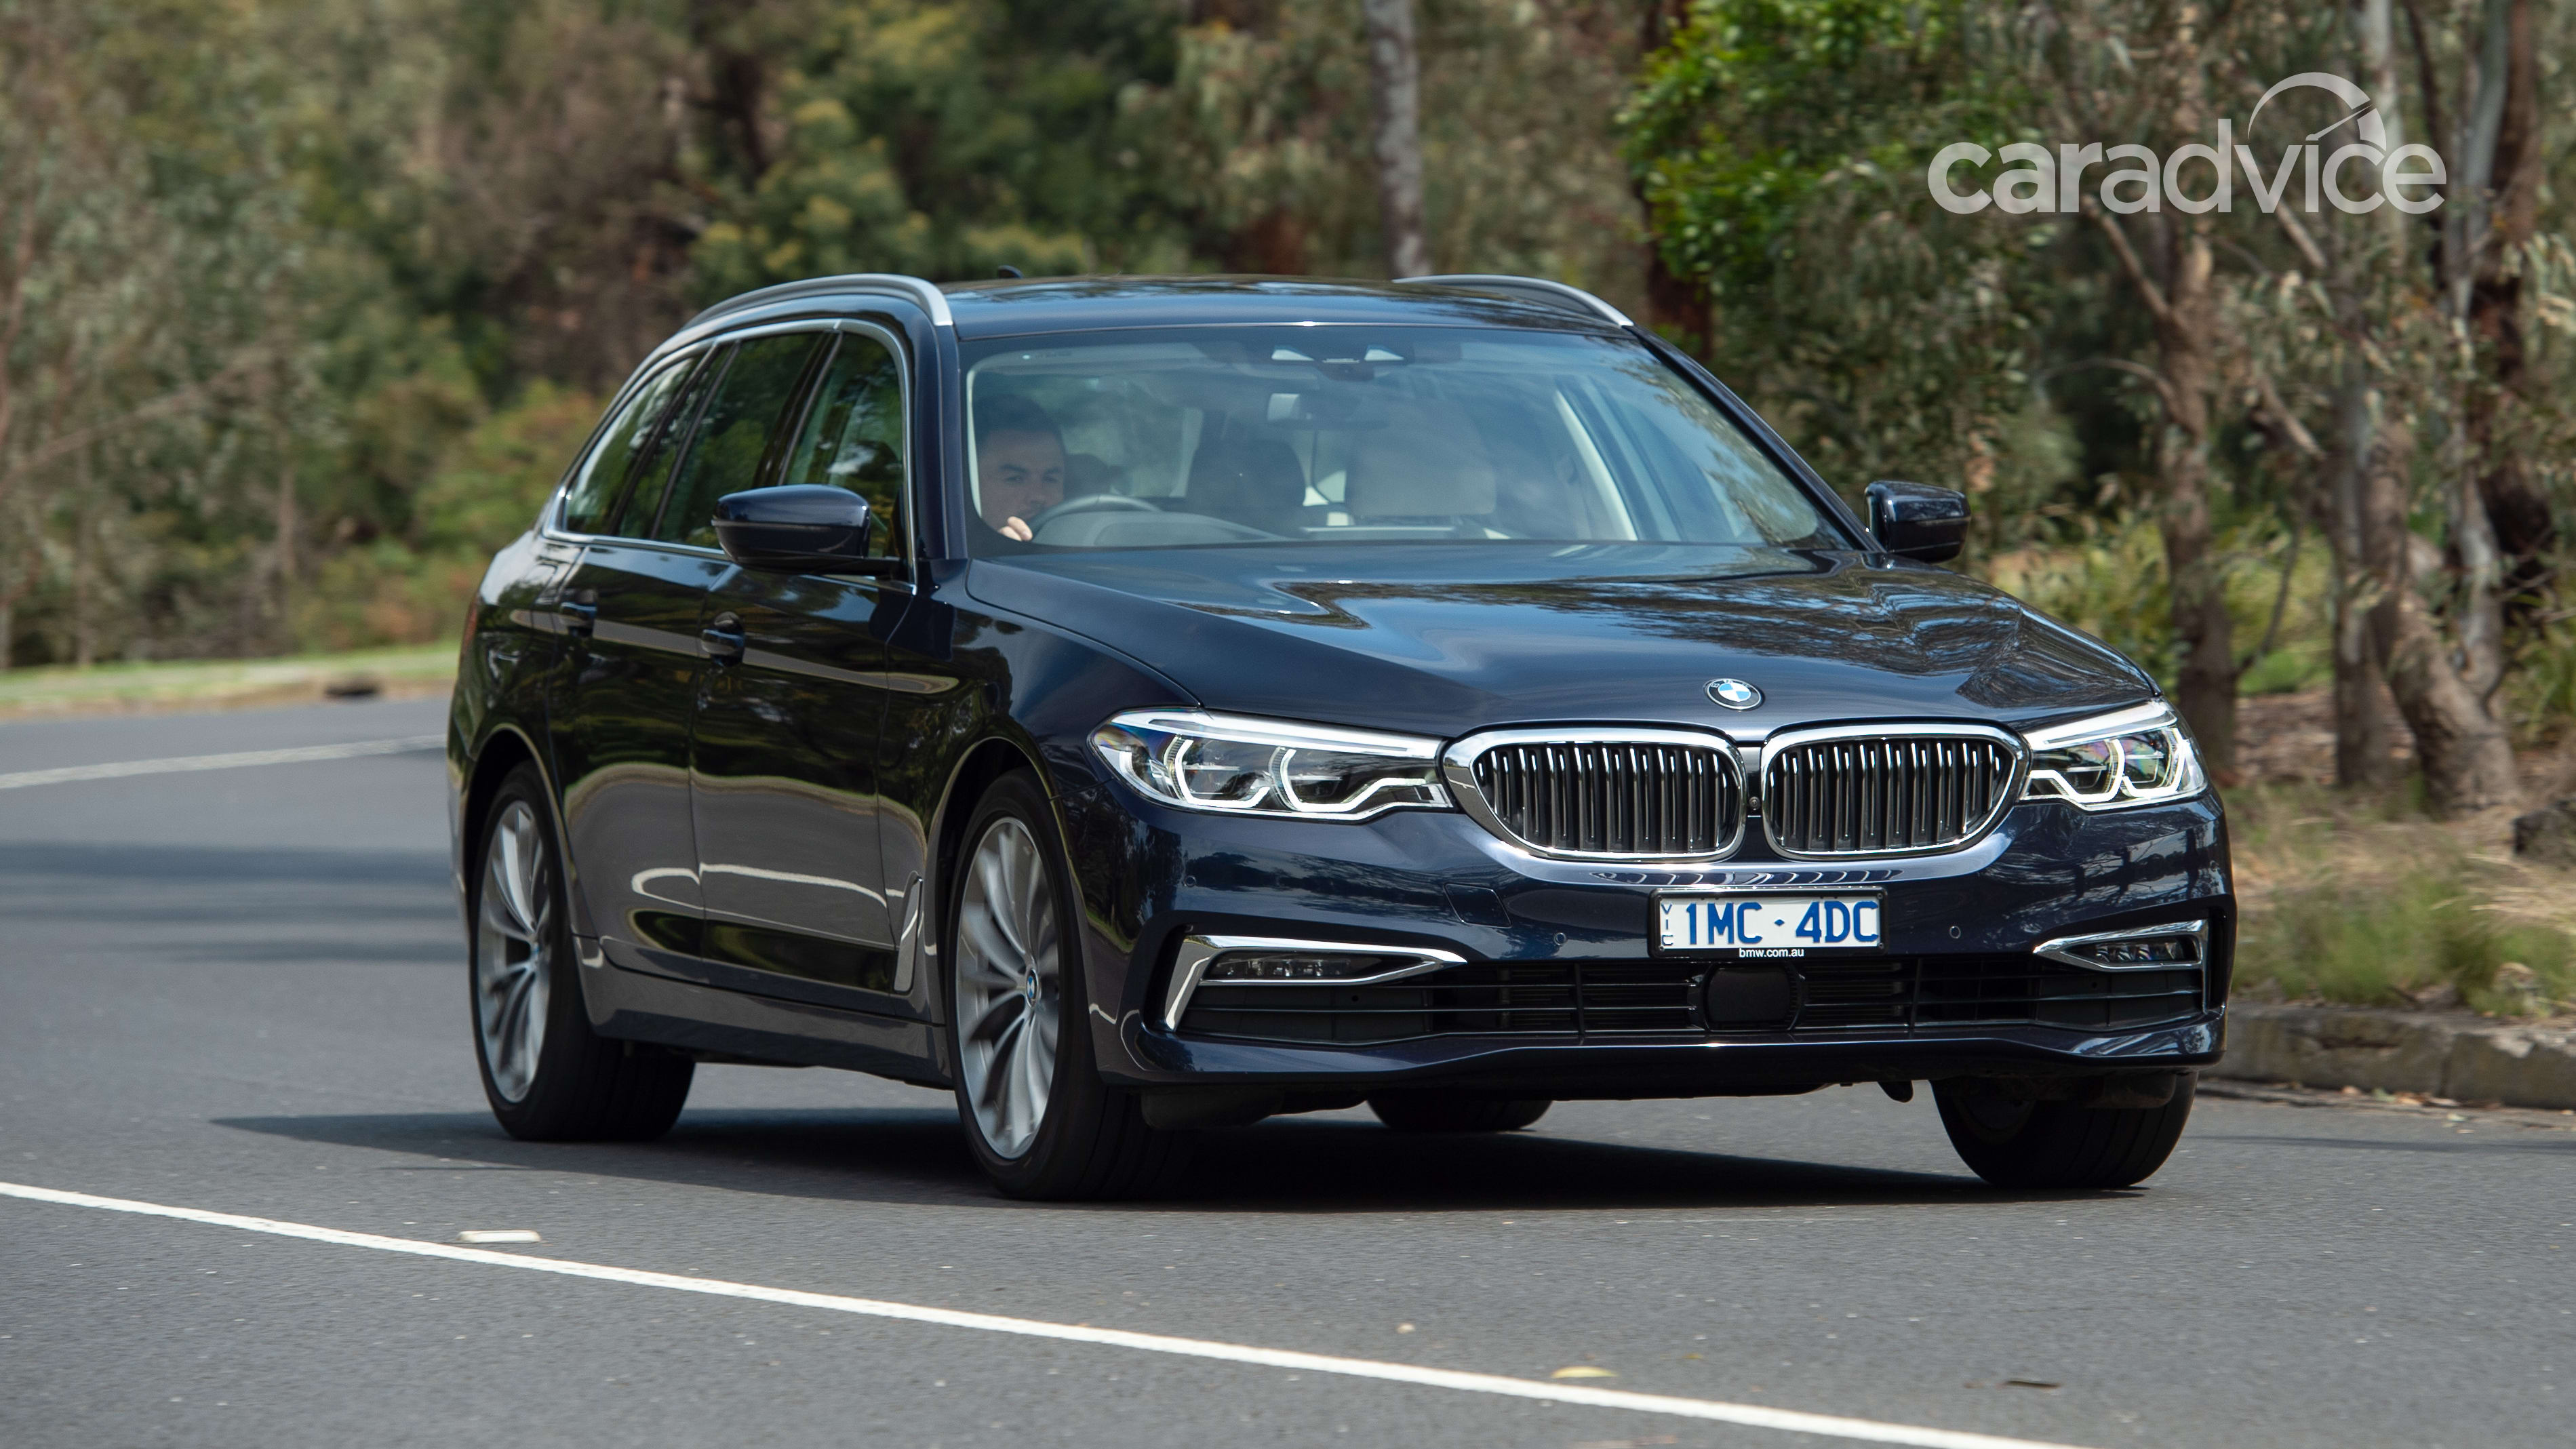 BMW 5 Series Touring (G31) Photos and Specs. Photo: BMW 5 ...